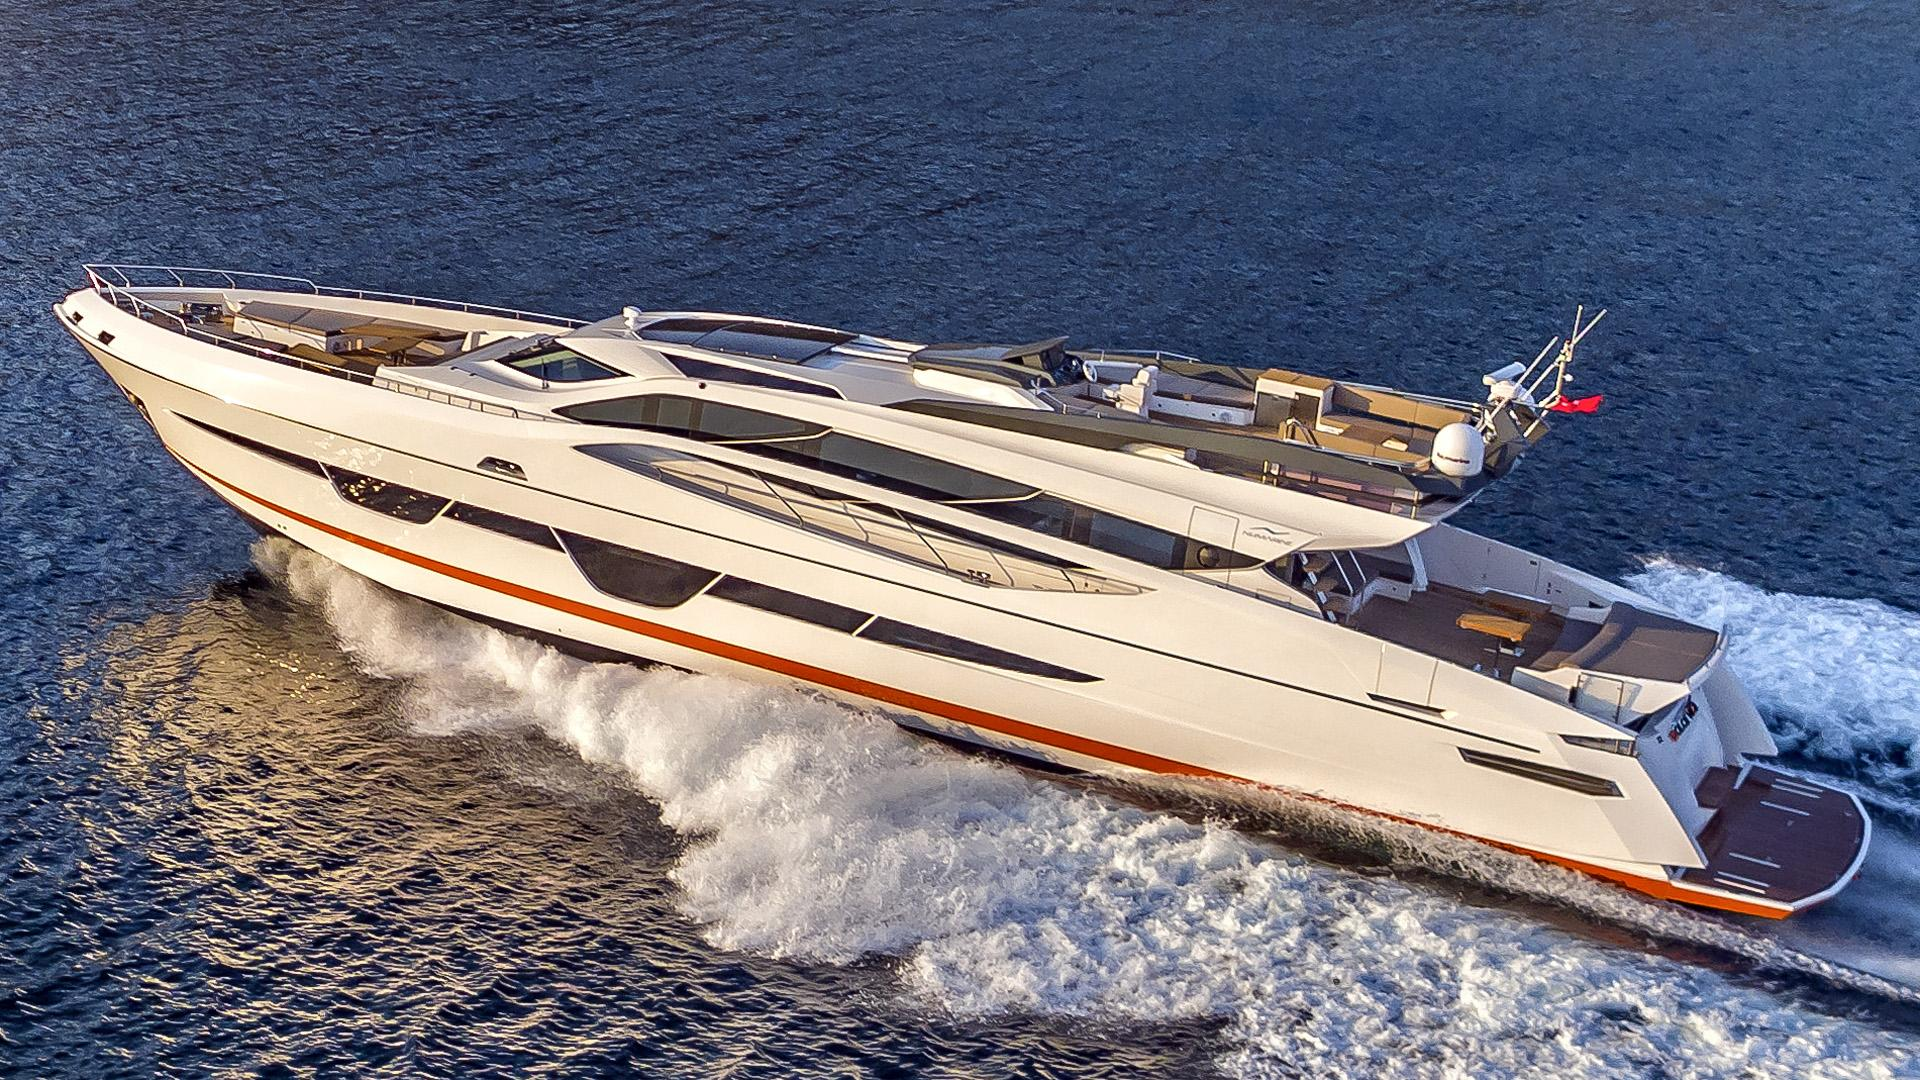 motoryacht numarine 105 ht 2016 32m cruising profile